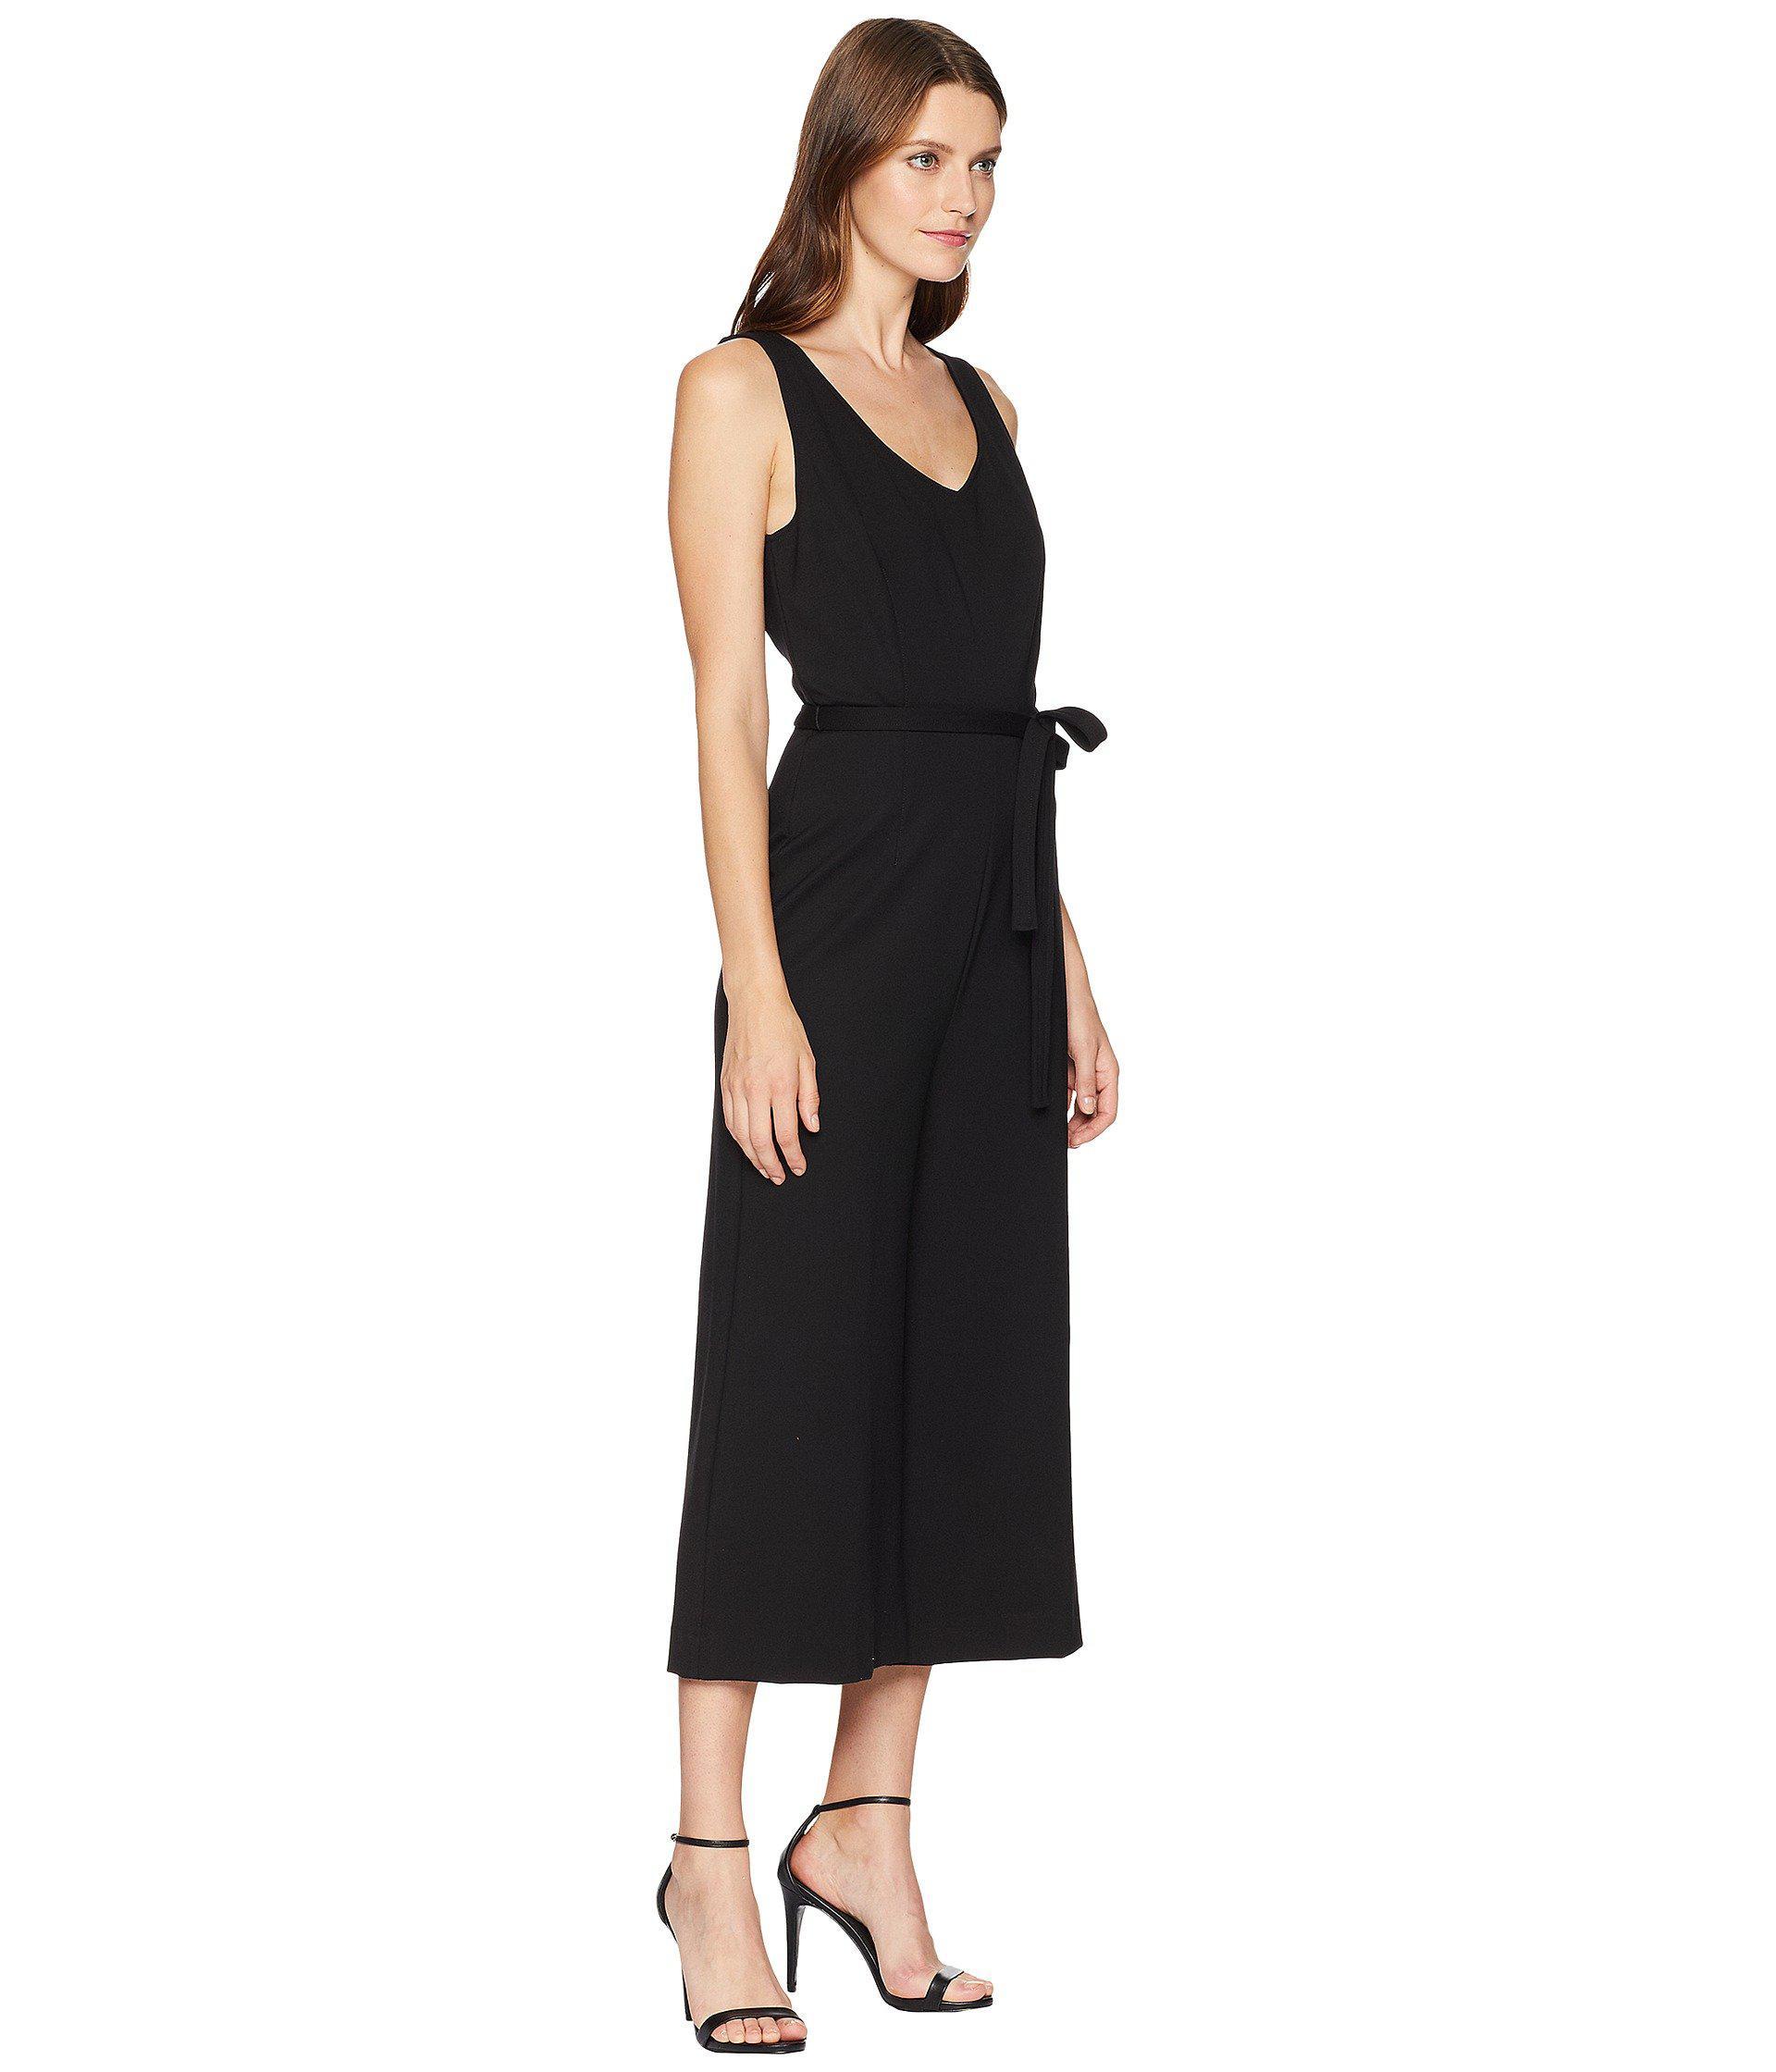 b2be61b6a18e Three Dots - Black Ponte Sleeveless Jumpsuit - Lyst. View fullscreen